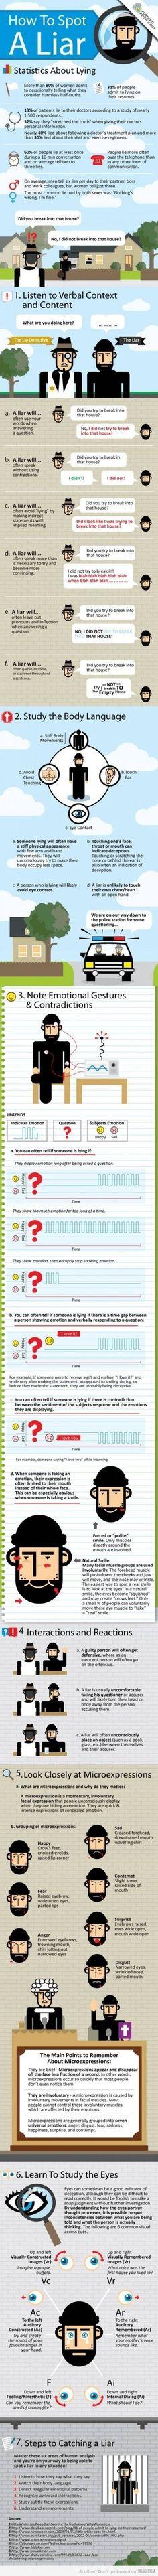 Psychology-Infographic-lie-detector Psychology Infographic : lie detector